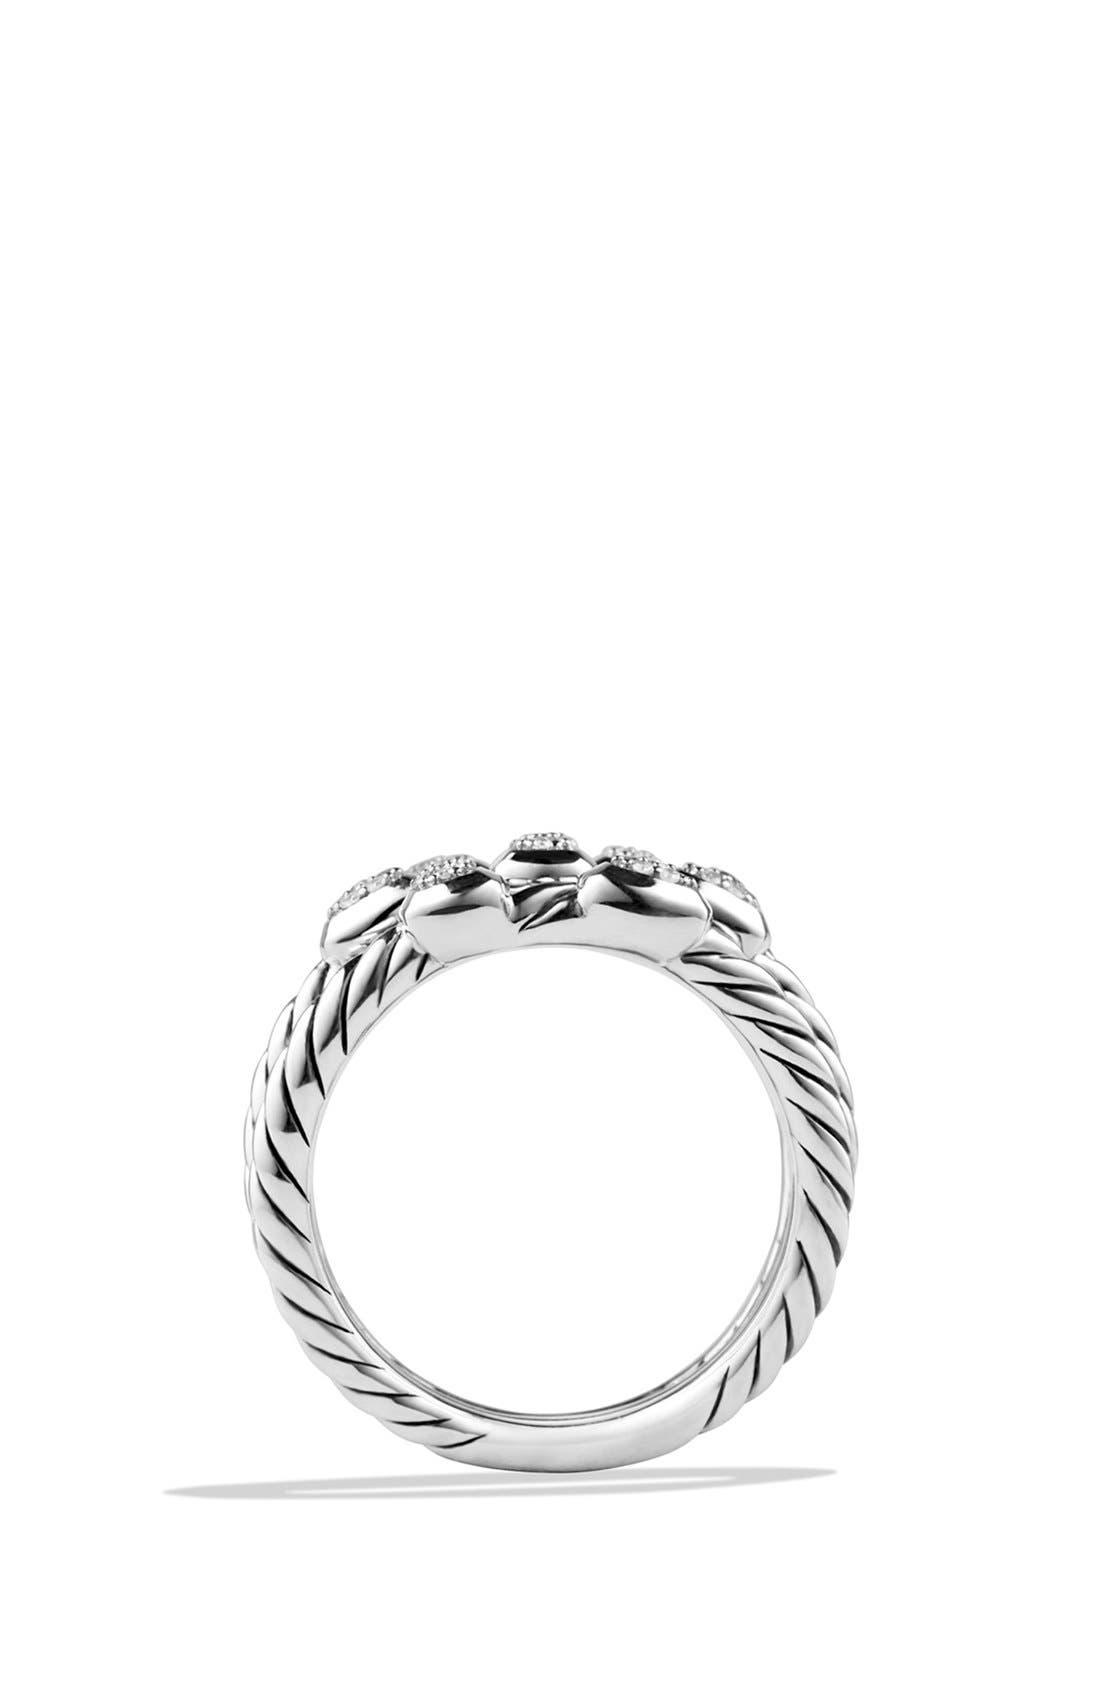 'Confetti' Ring with Diamonds,                             Alternate thumbnail 3, color,                             040